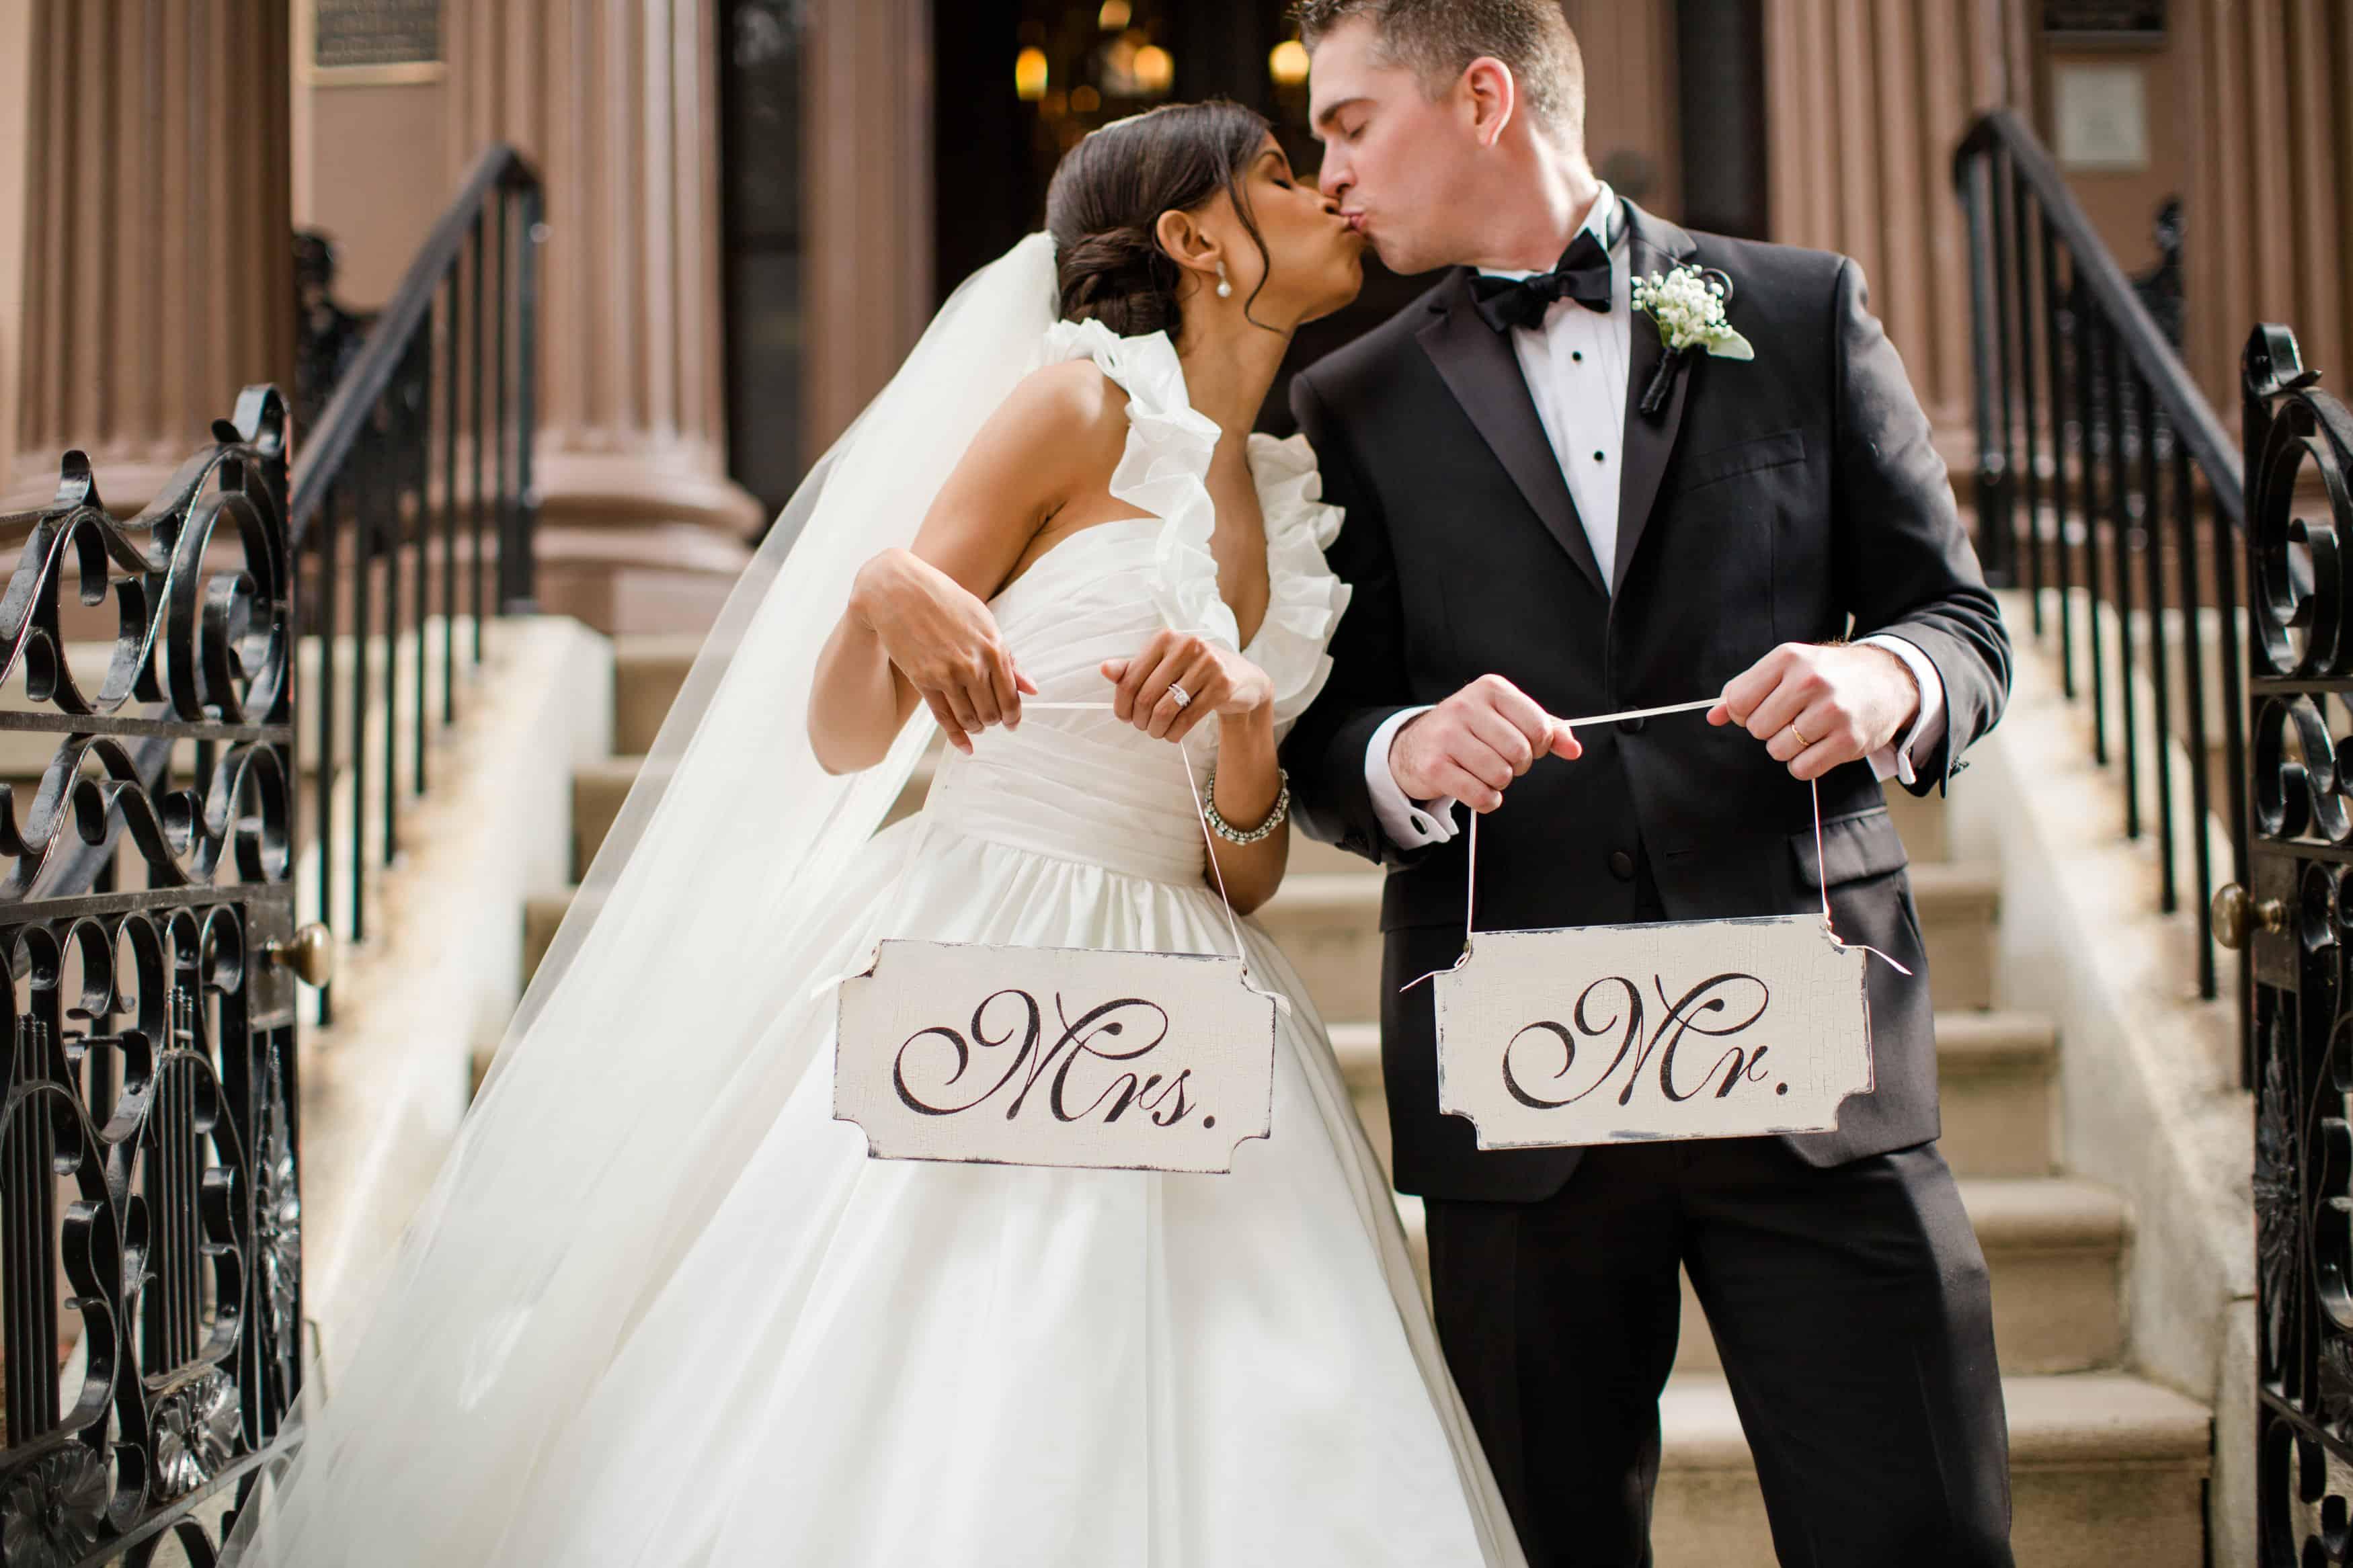 Plan the perfect wedding